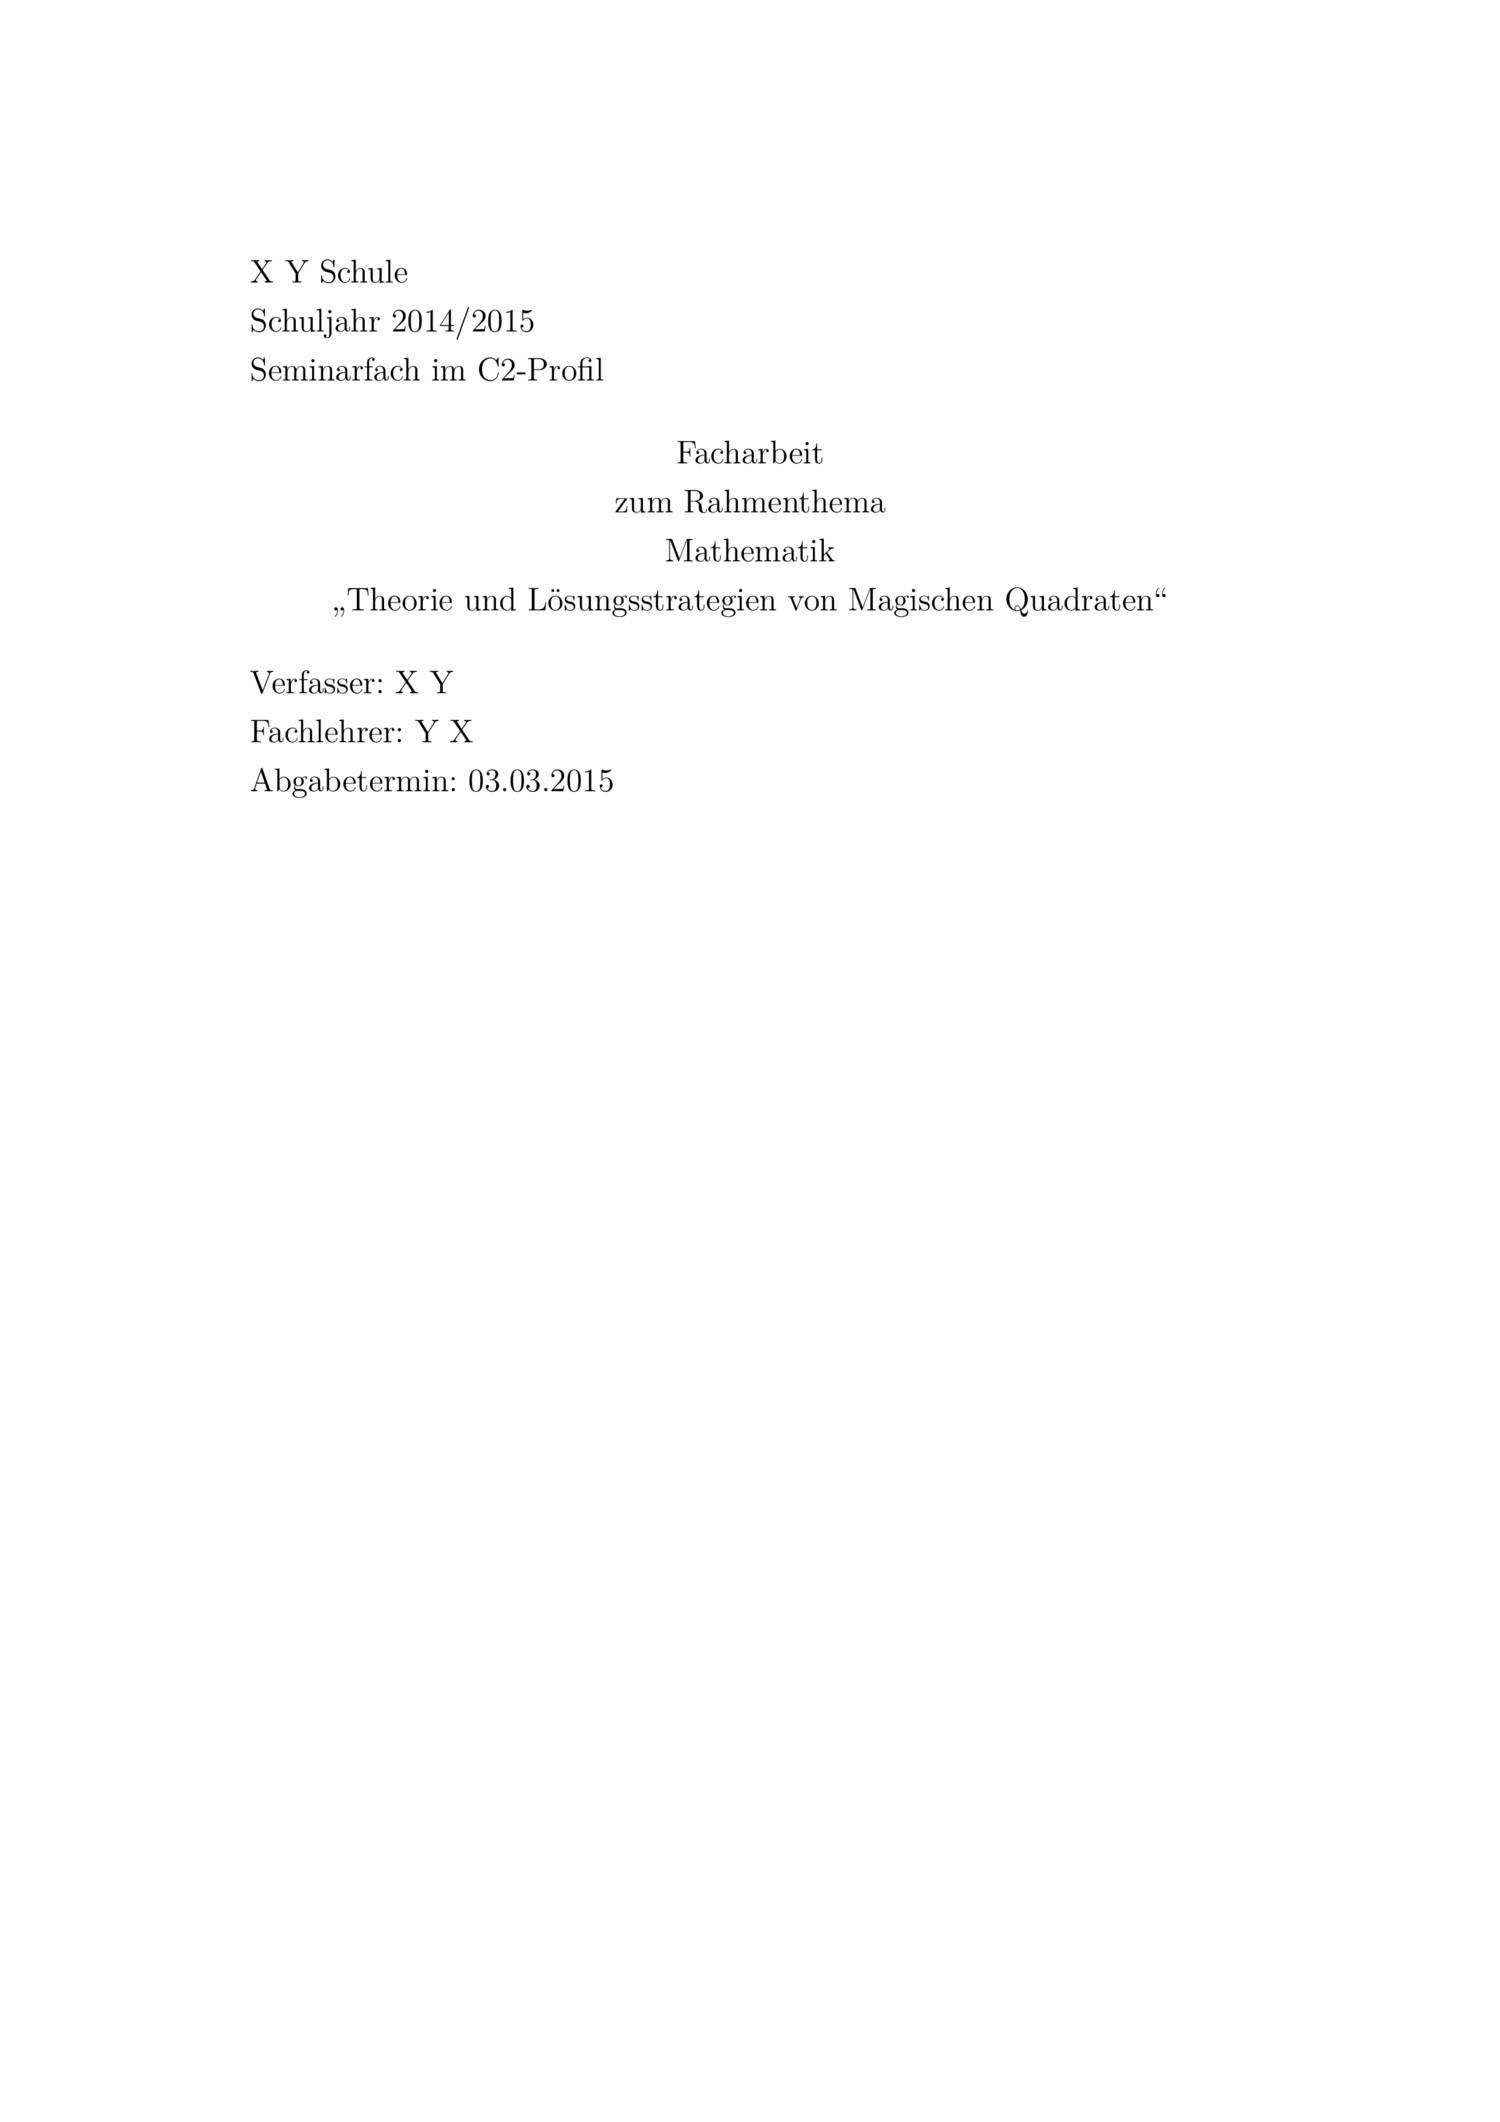 Wunderbar Produktionsanrufblatt Vorlage Galerie - Entry Level Resume ...